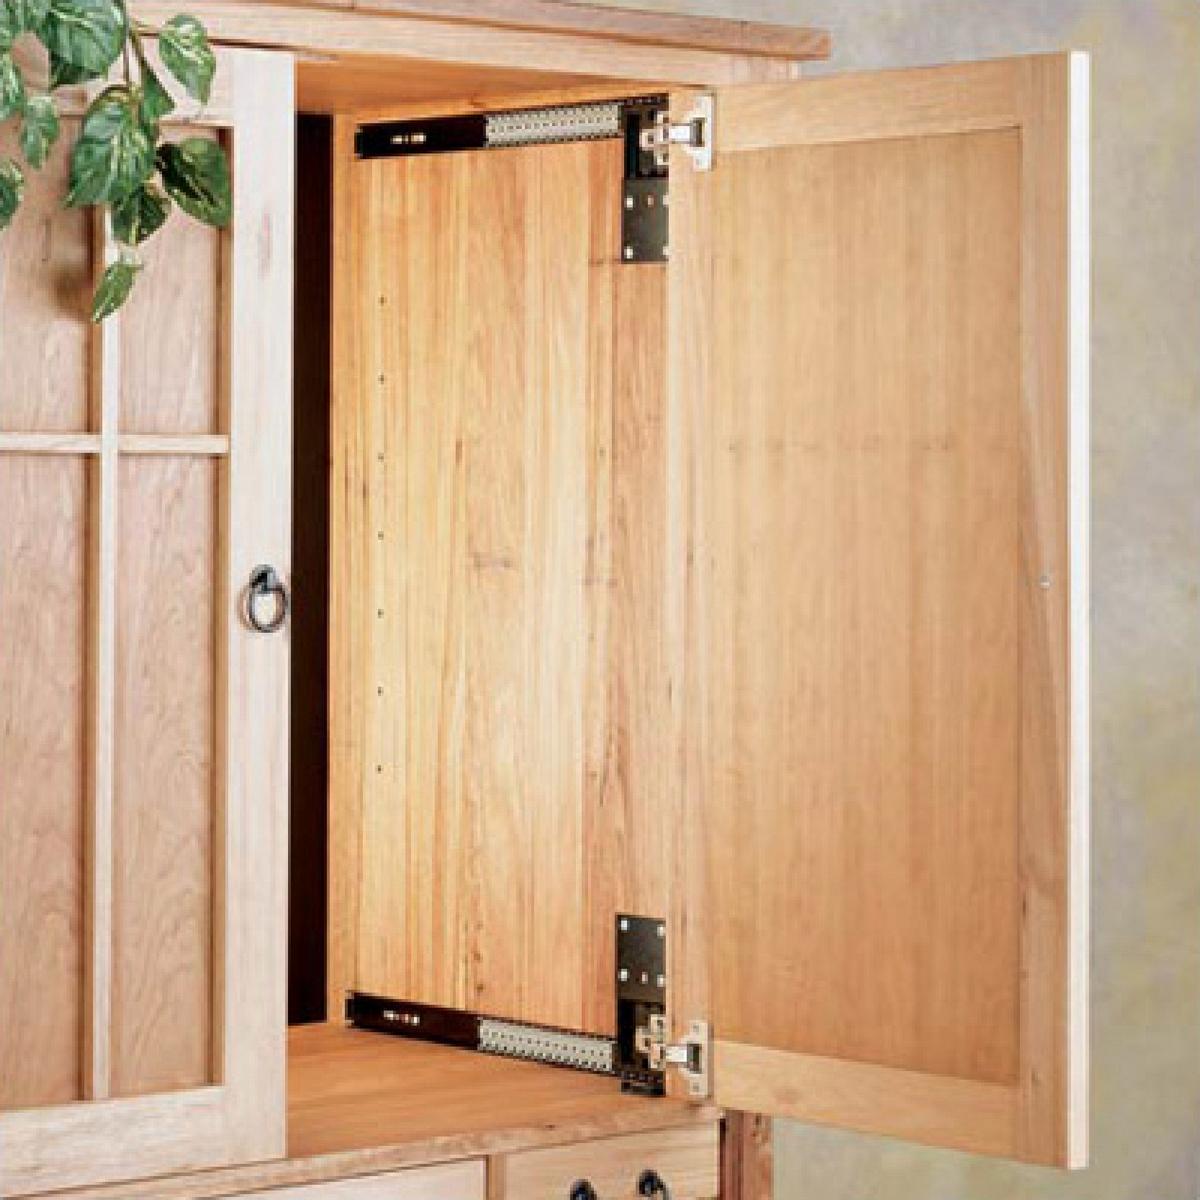 hafele accuride cb123 12d pocket door. Black Bedroom Furniture Sets. Home Design Ideas